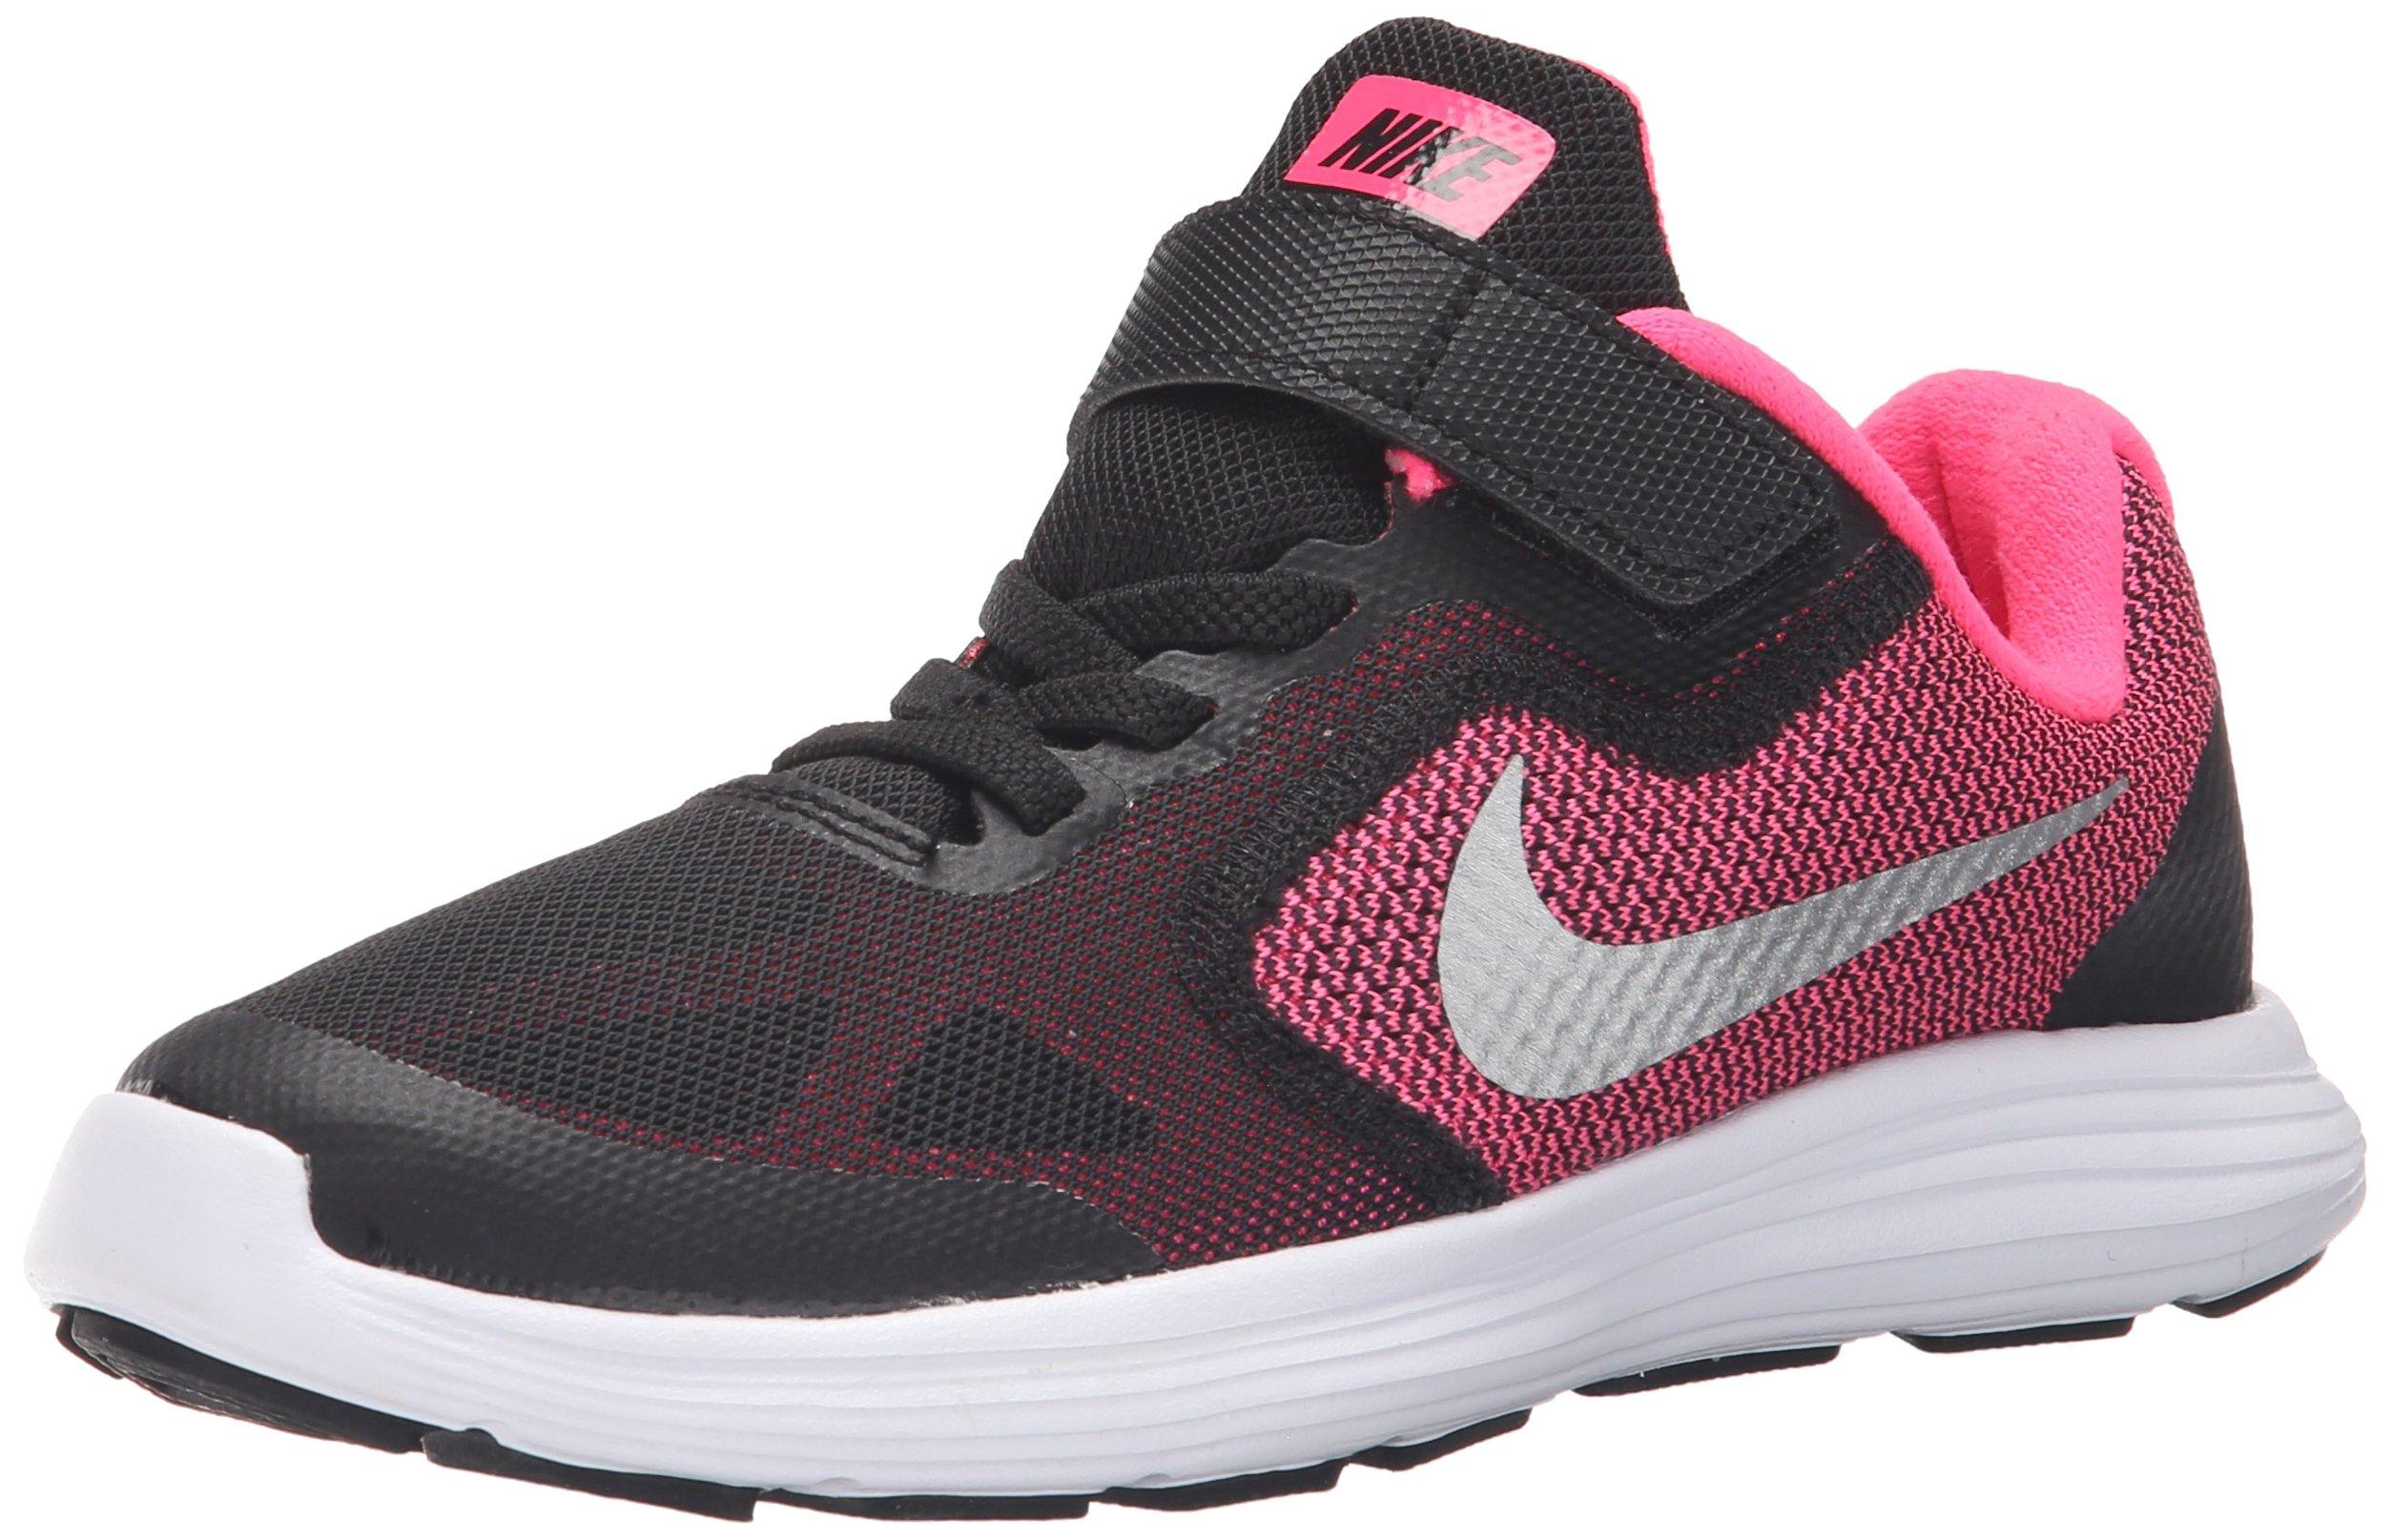 NIKE Kids' Revolution 3 Running Shoe (PSV), Black/Metallic Silver/Hyper Pink/White, 1.5 M US Little Kid by Nike (Image #1)